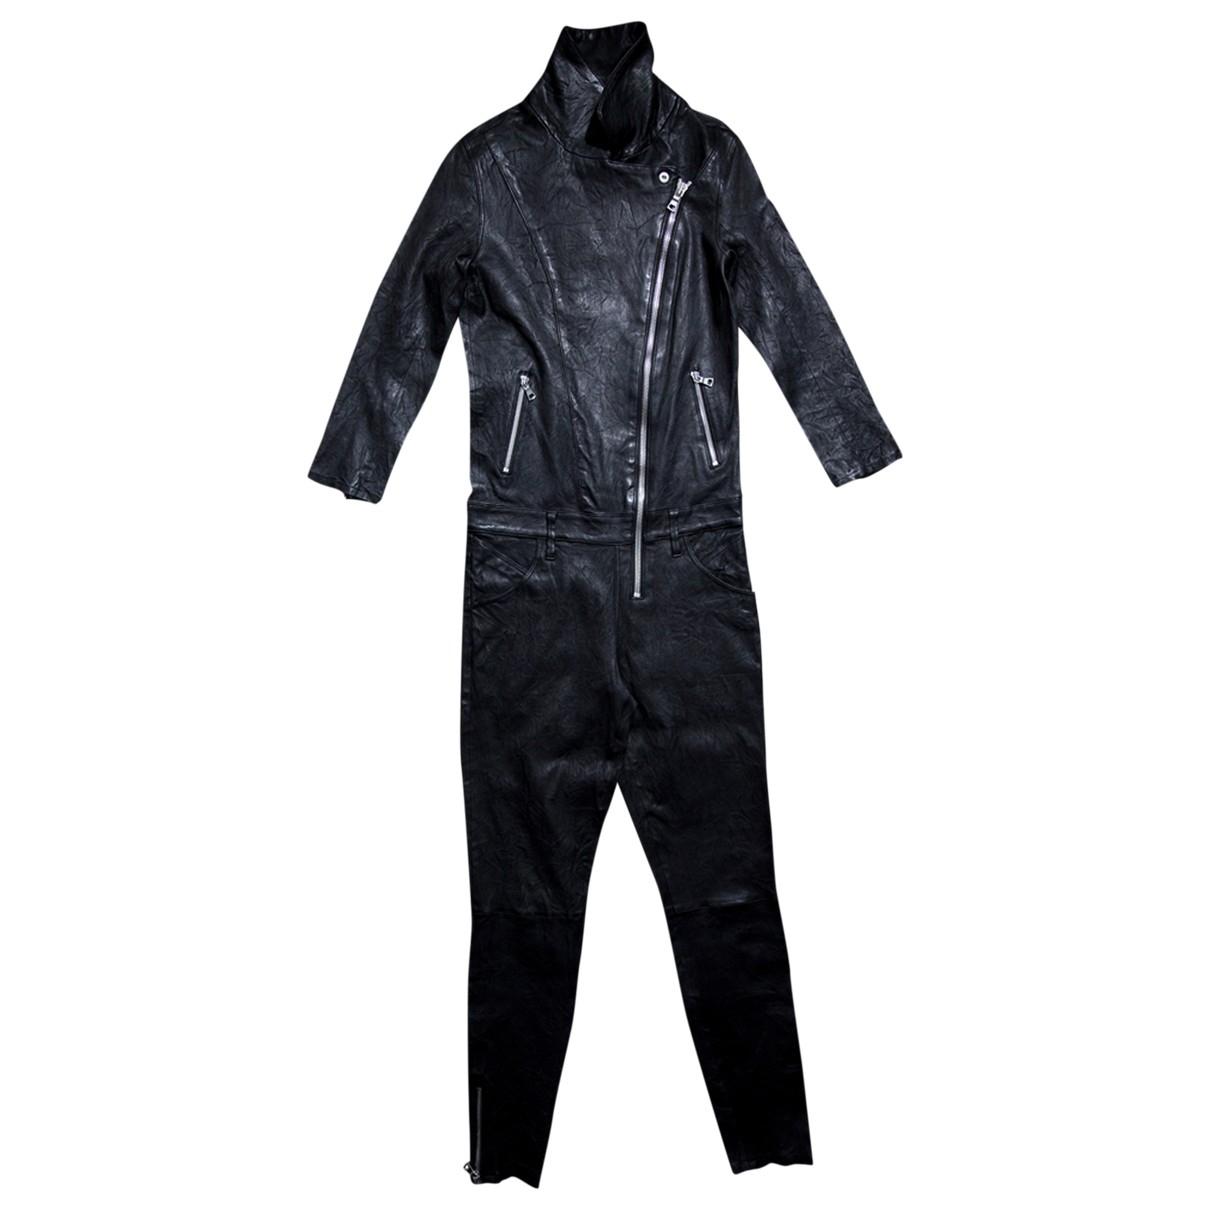 Rta \N Black Leather jumpsuit for Women S International